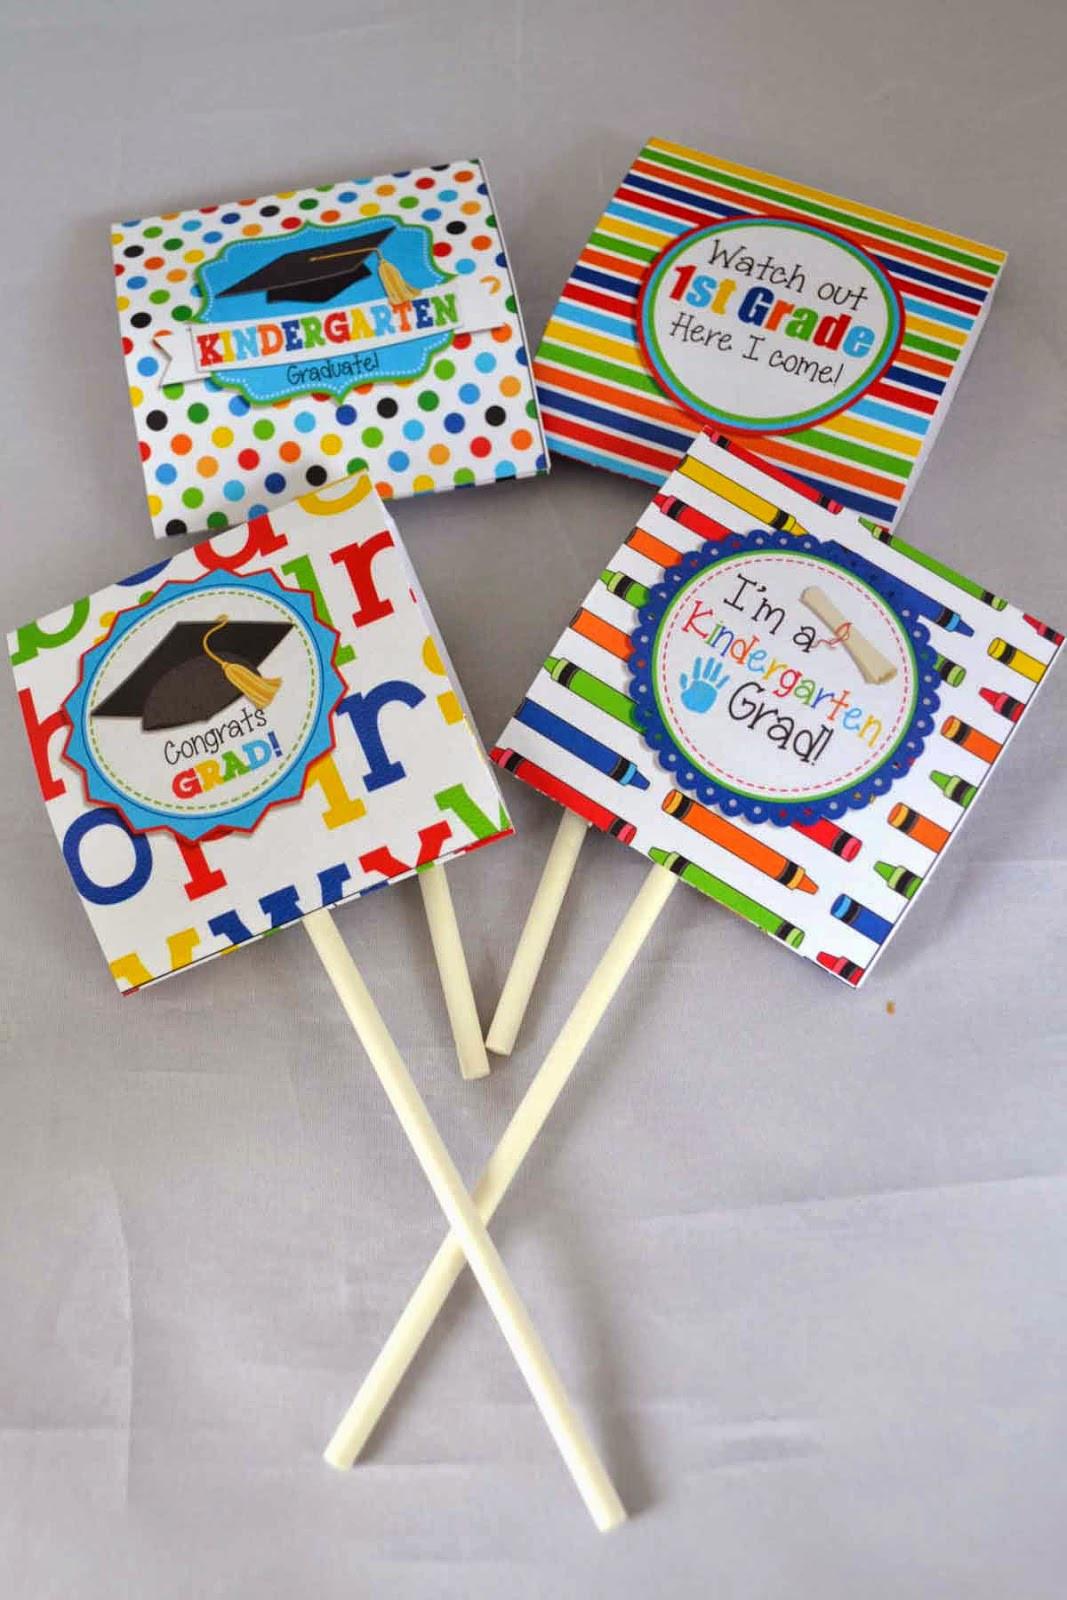 Best ideas about Gift Ideas For Kindergarten Graduation . Save or Pin A Manda Creation Kindergarten Graduation Party Printables Now.